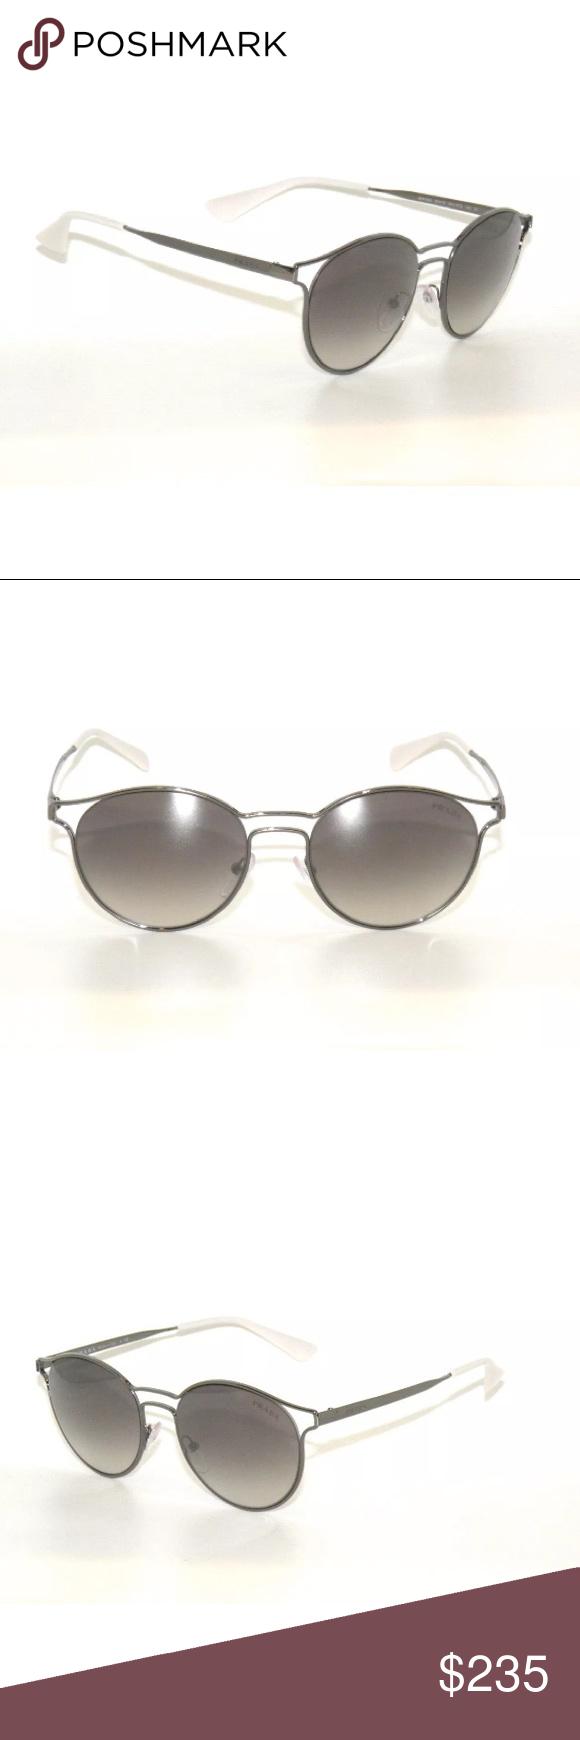 23fd63ff196 Prada Sunglasses 62SS Cinema Sunglasses New Comes with Prada case Authentic Prada  Accessories Sunglasses